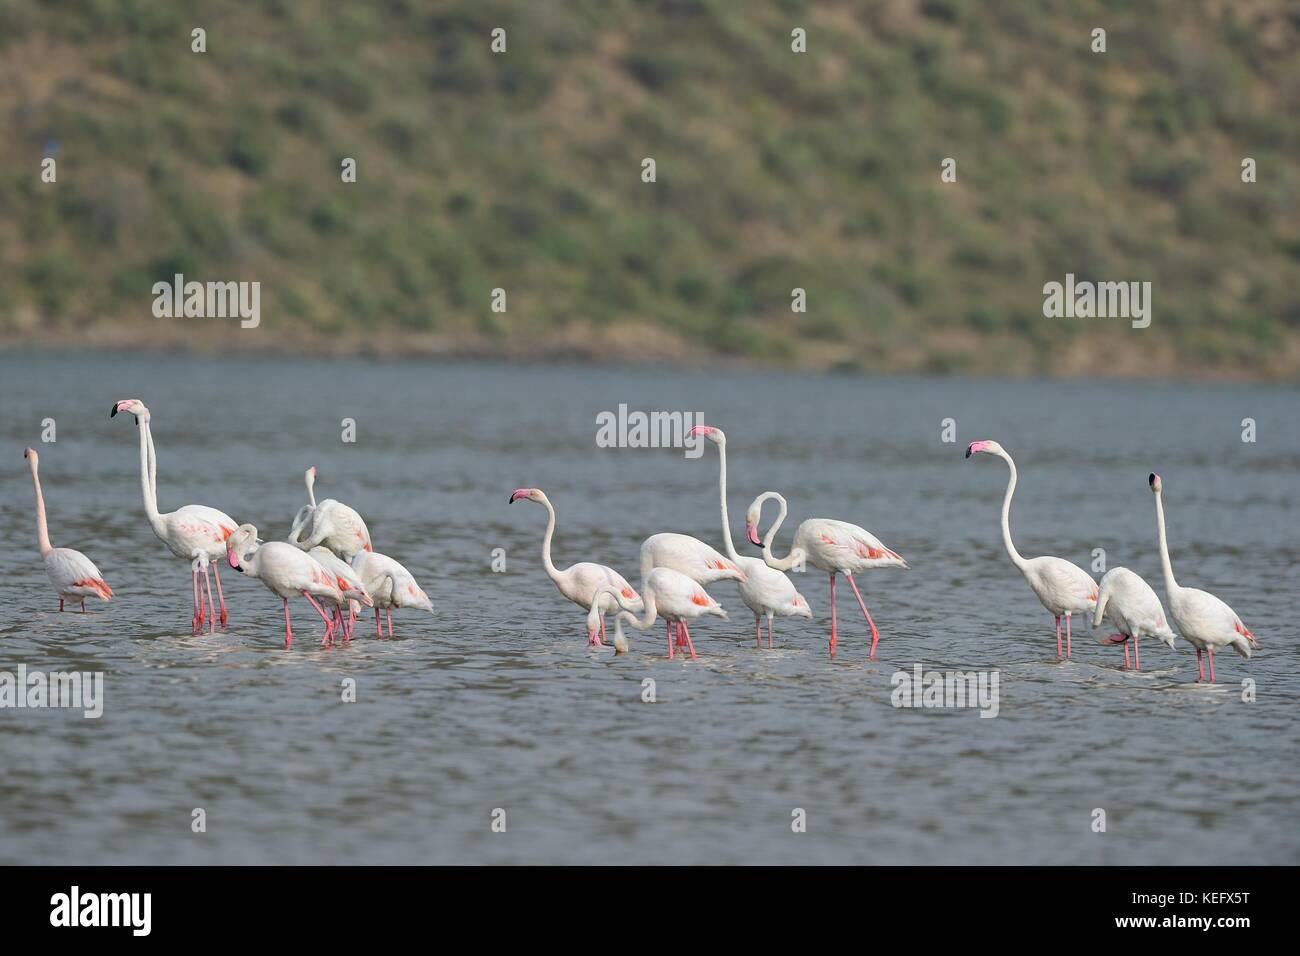 Greater Flamingo (Phoenicopterus roseus - Phoenicopterus ruber roseus) flock of birds standing in shallow water - Stock Image